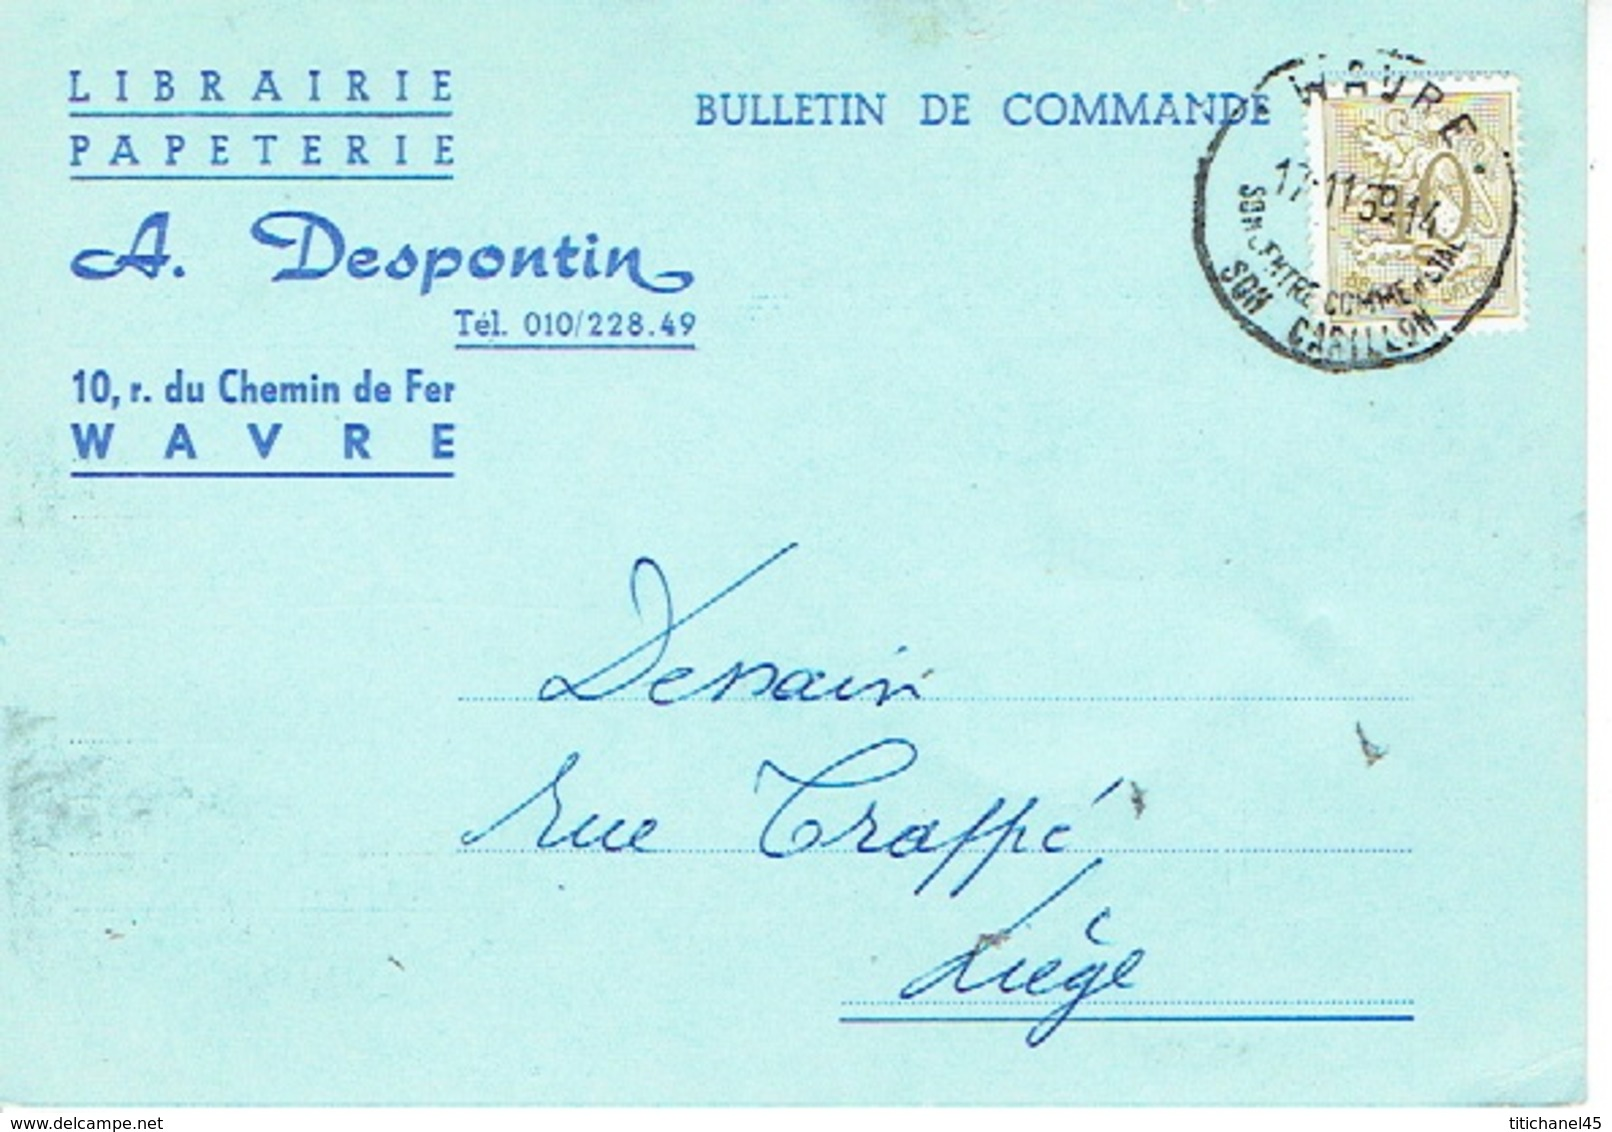 CP  Publicitaire WAVRE 1959 - A. DESPONTIN - Librairie - Papeterie - Wavre